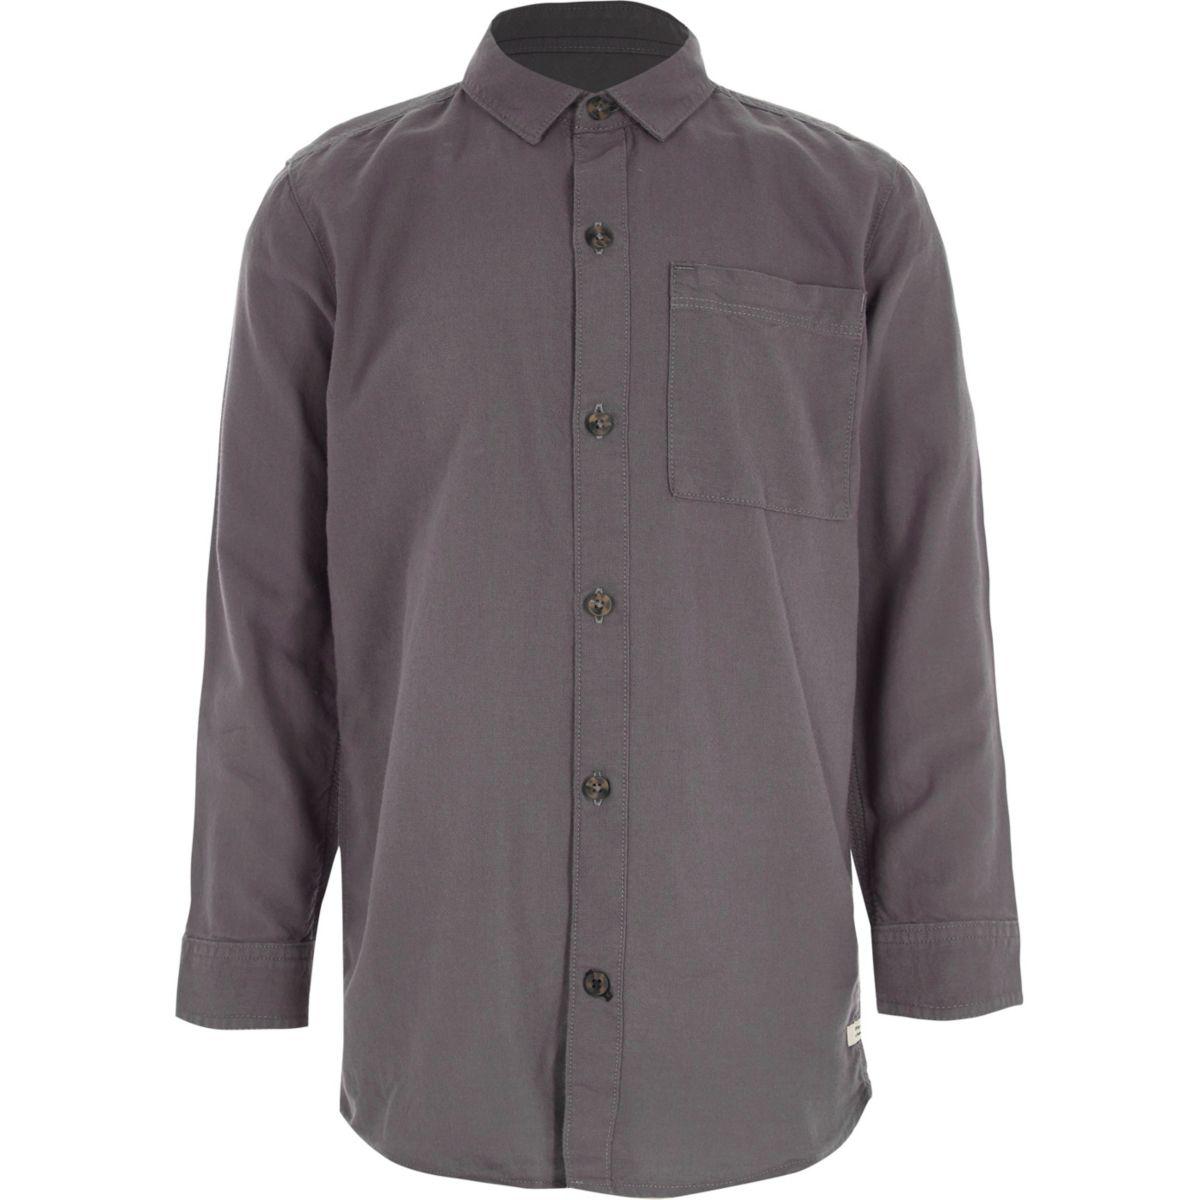 Boys dark purple long sleeve Oxford shirt